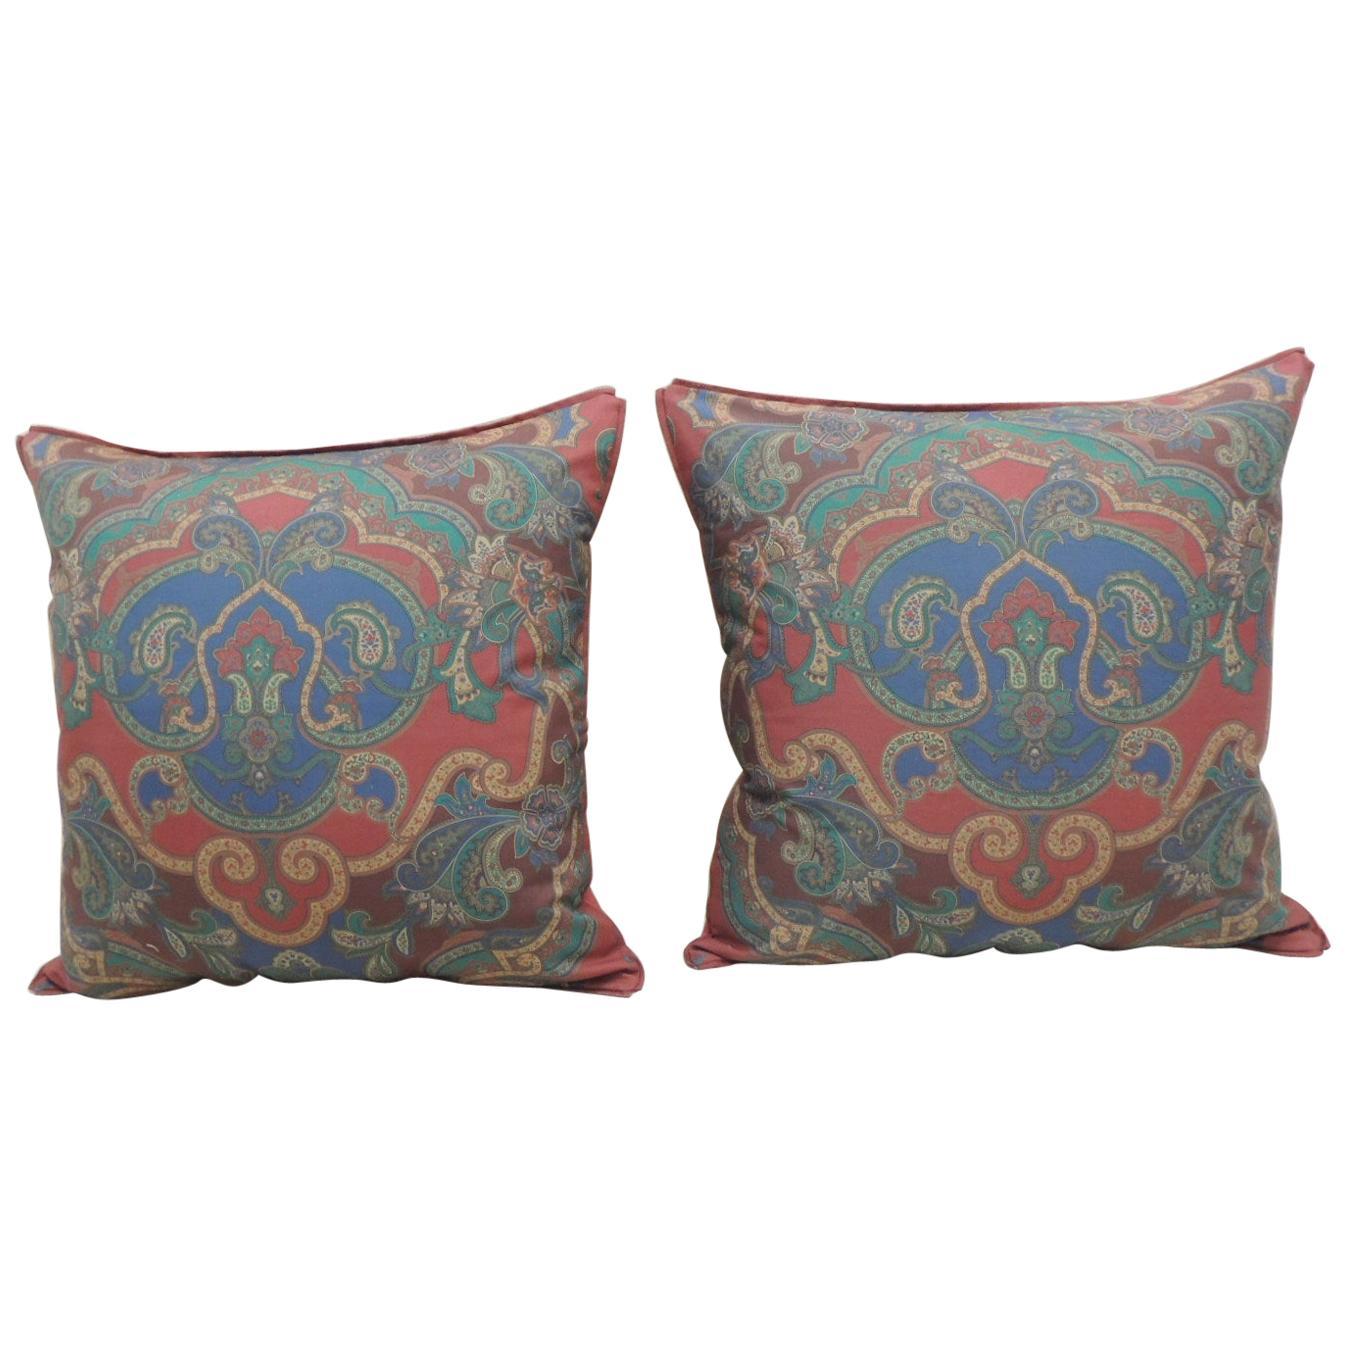 Pair of Modern Cotton Printed Paisleys Square Decorative Pillows